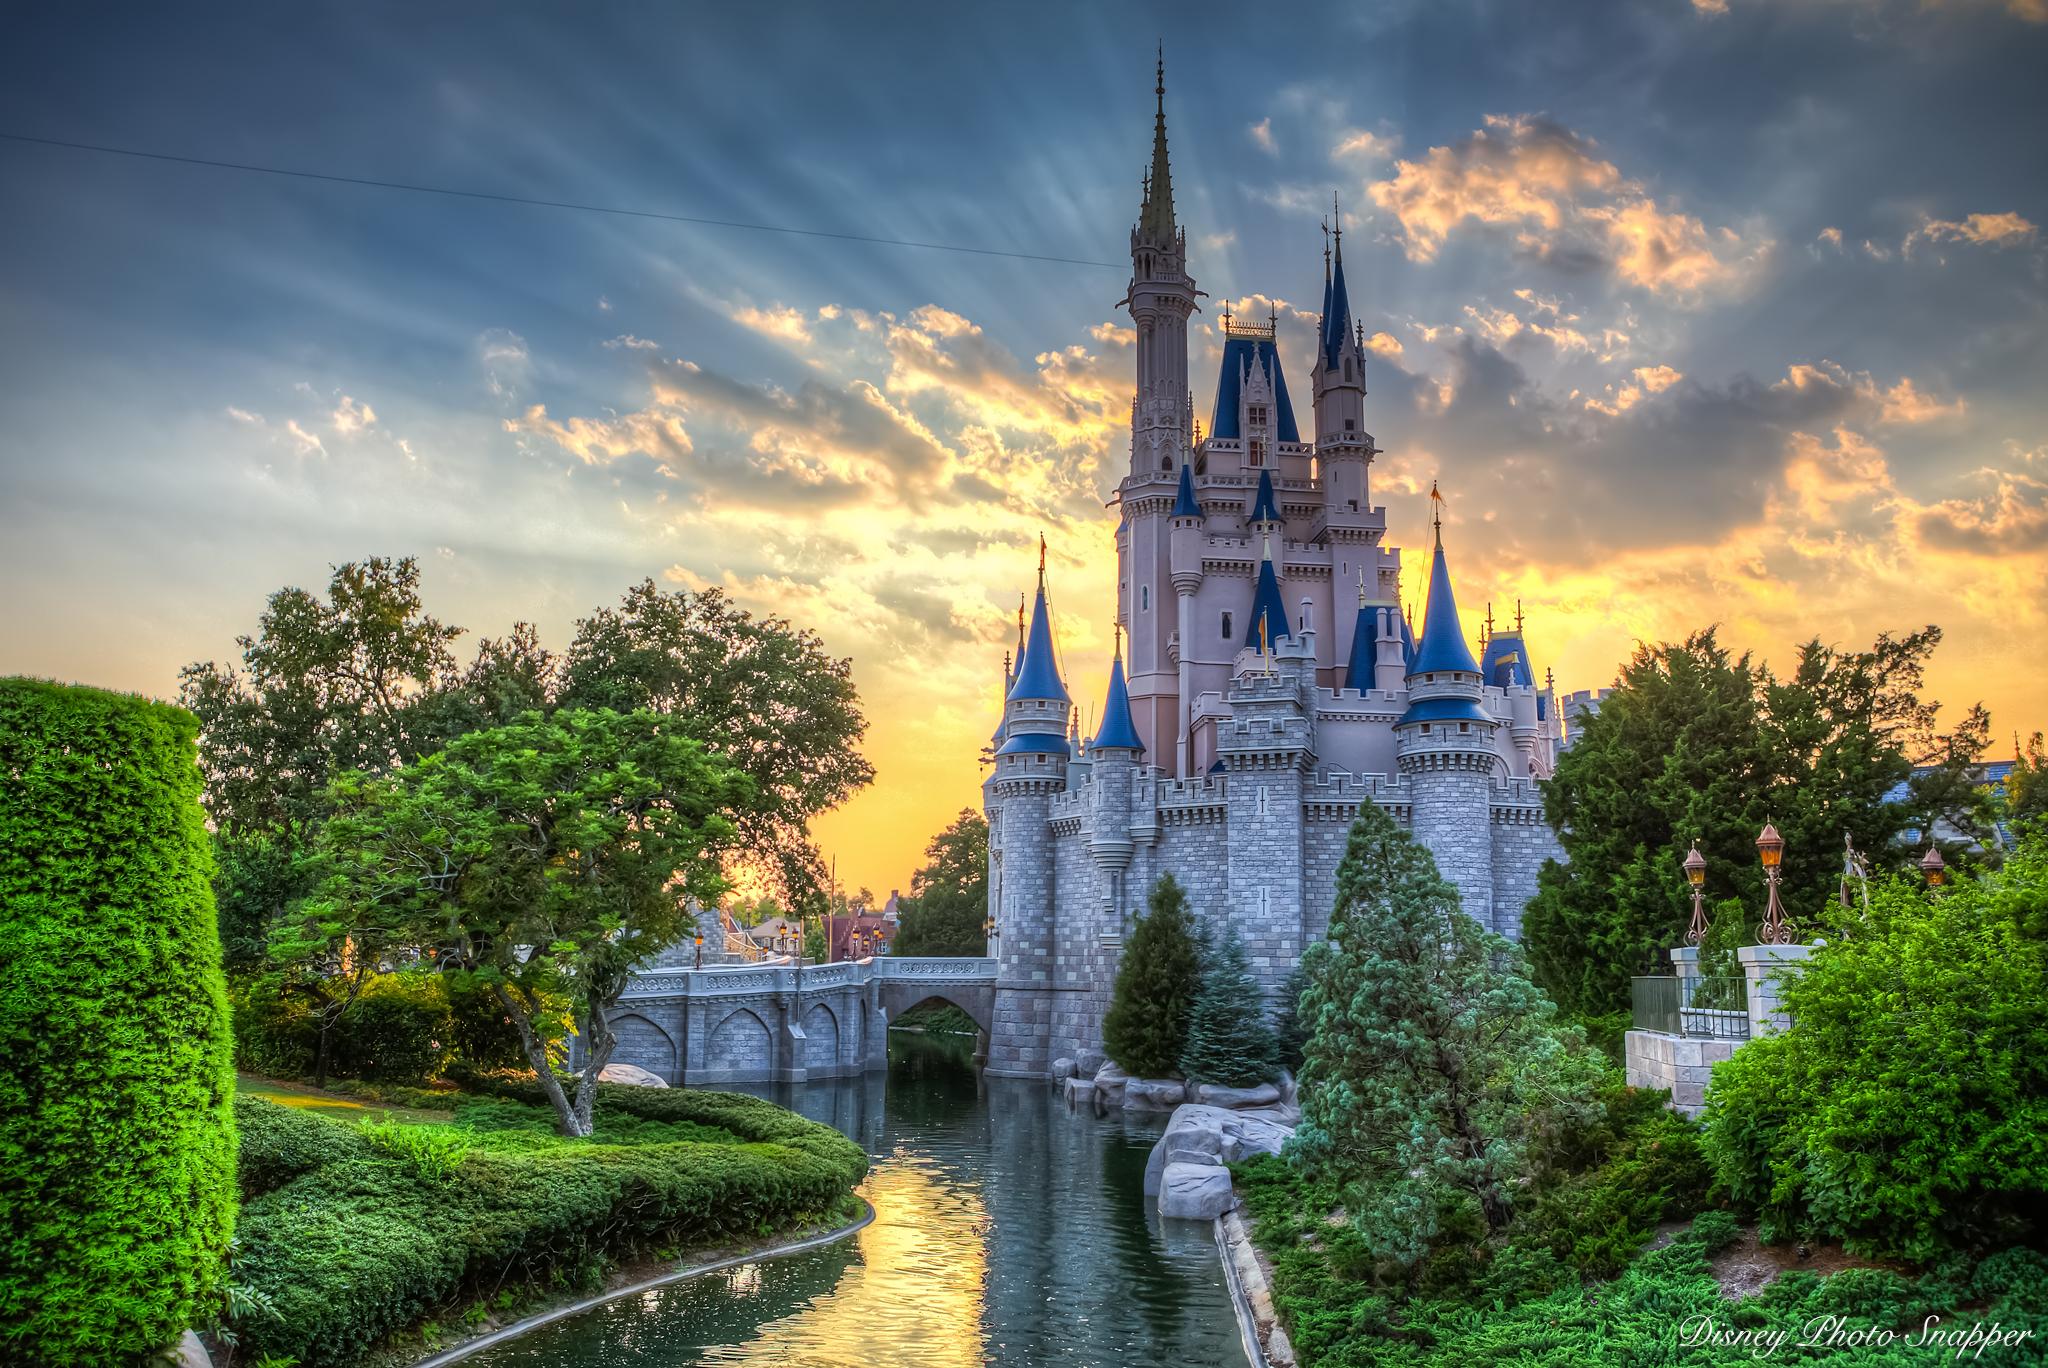 Wallpaper Sunset Canon Disney Disneyworld Fantasy Mickeymouse